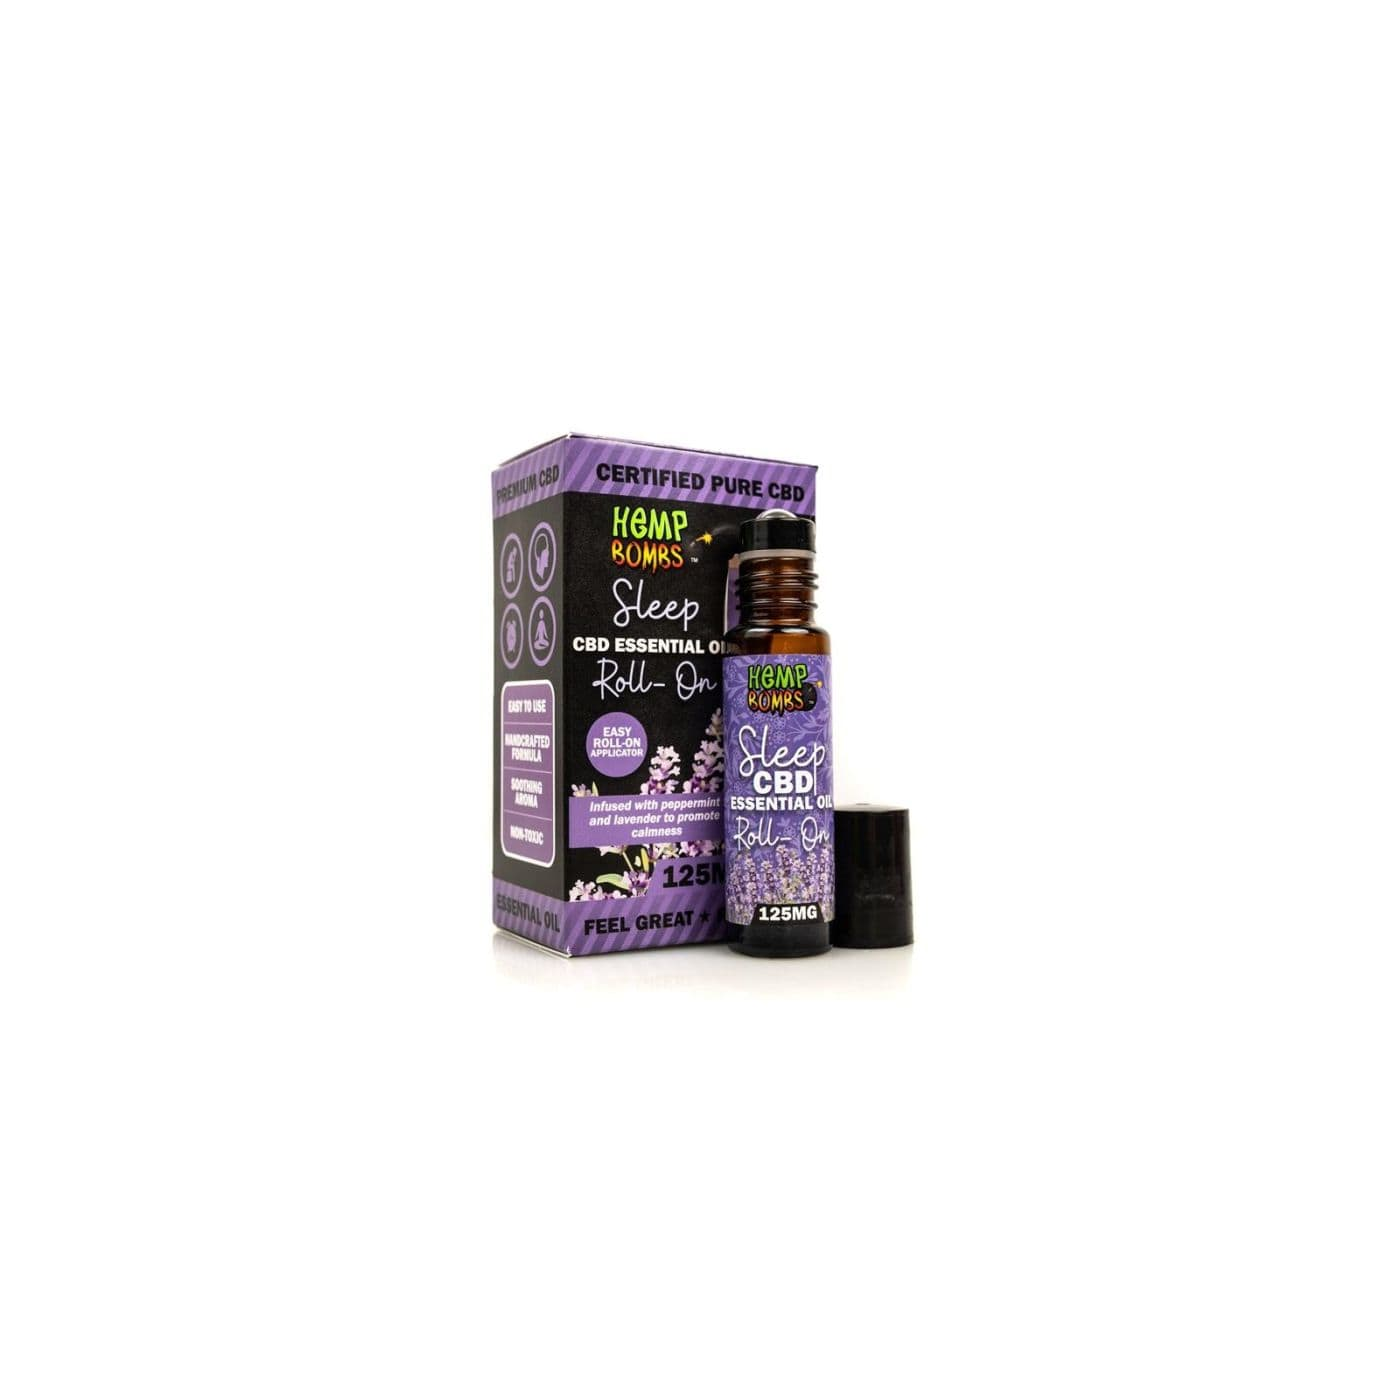 Hemp Bombs CBD Essential Oil Roller - Sleep Blend